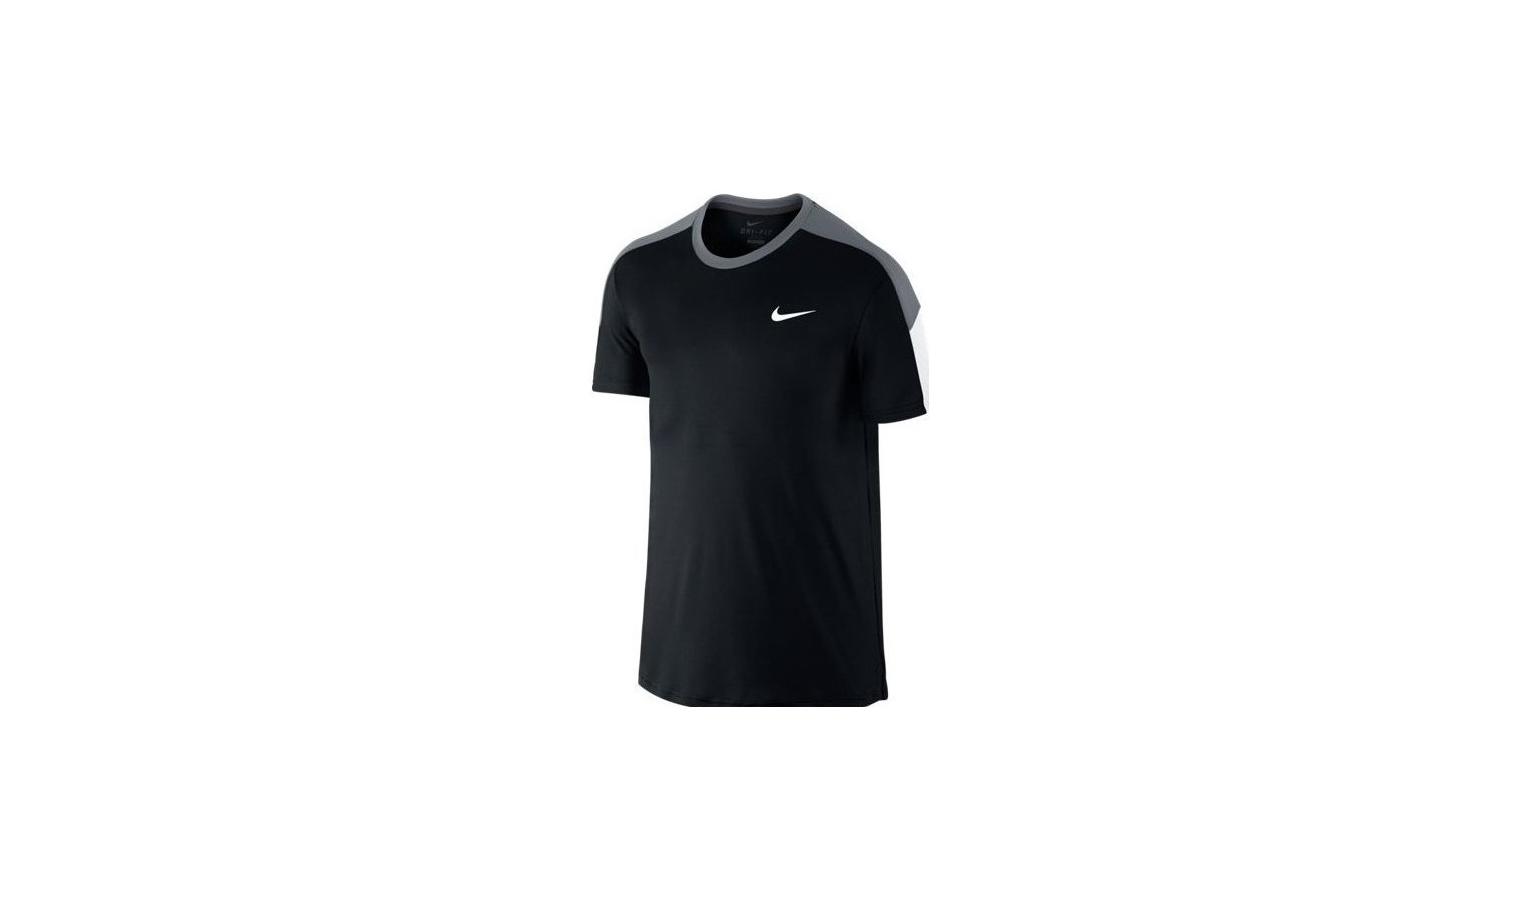 9af4b02e4338 Pánske tenisové tričko Nike TEAM COURT CREW čierne